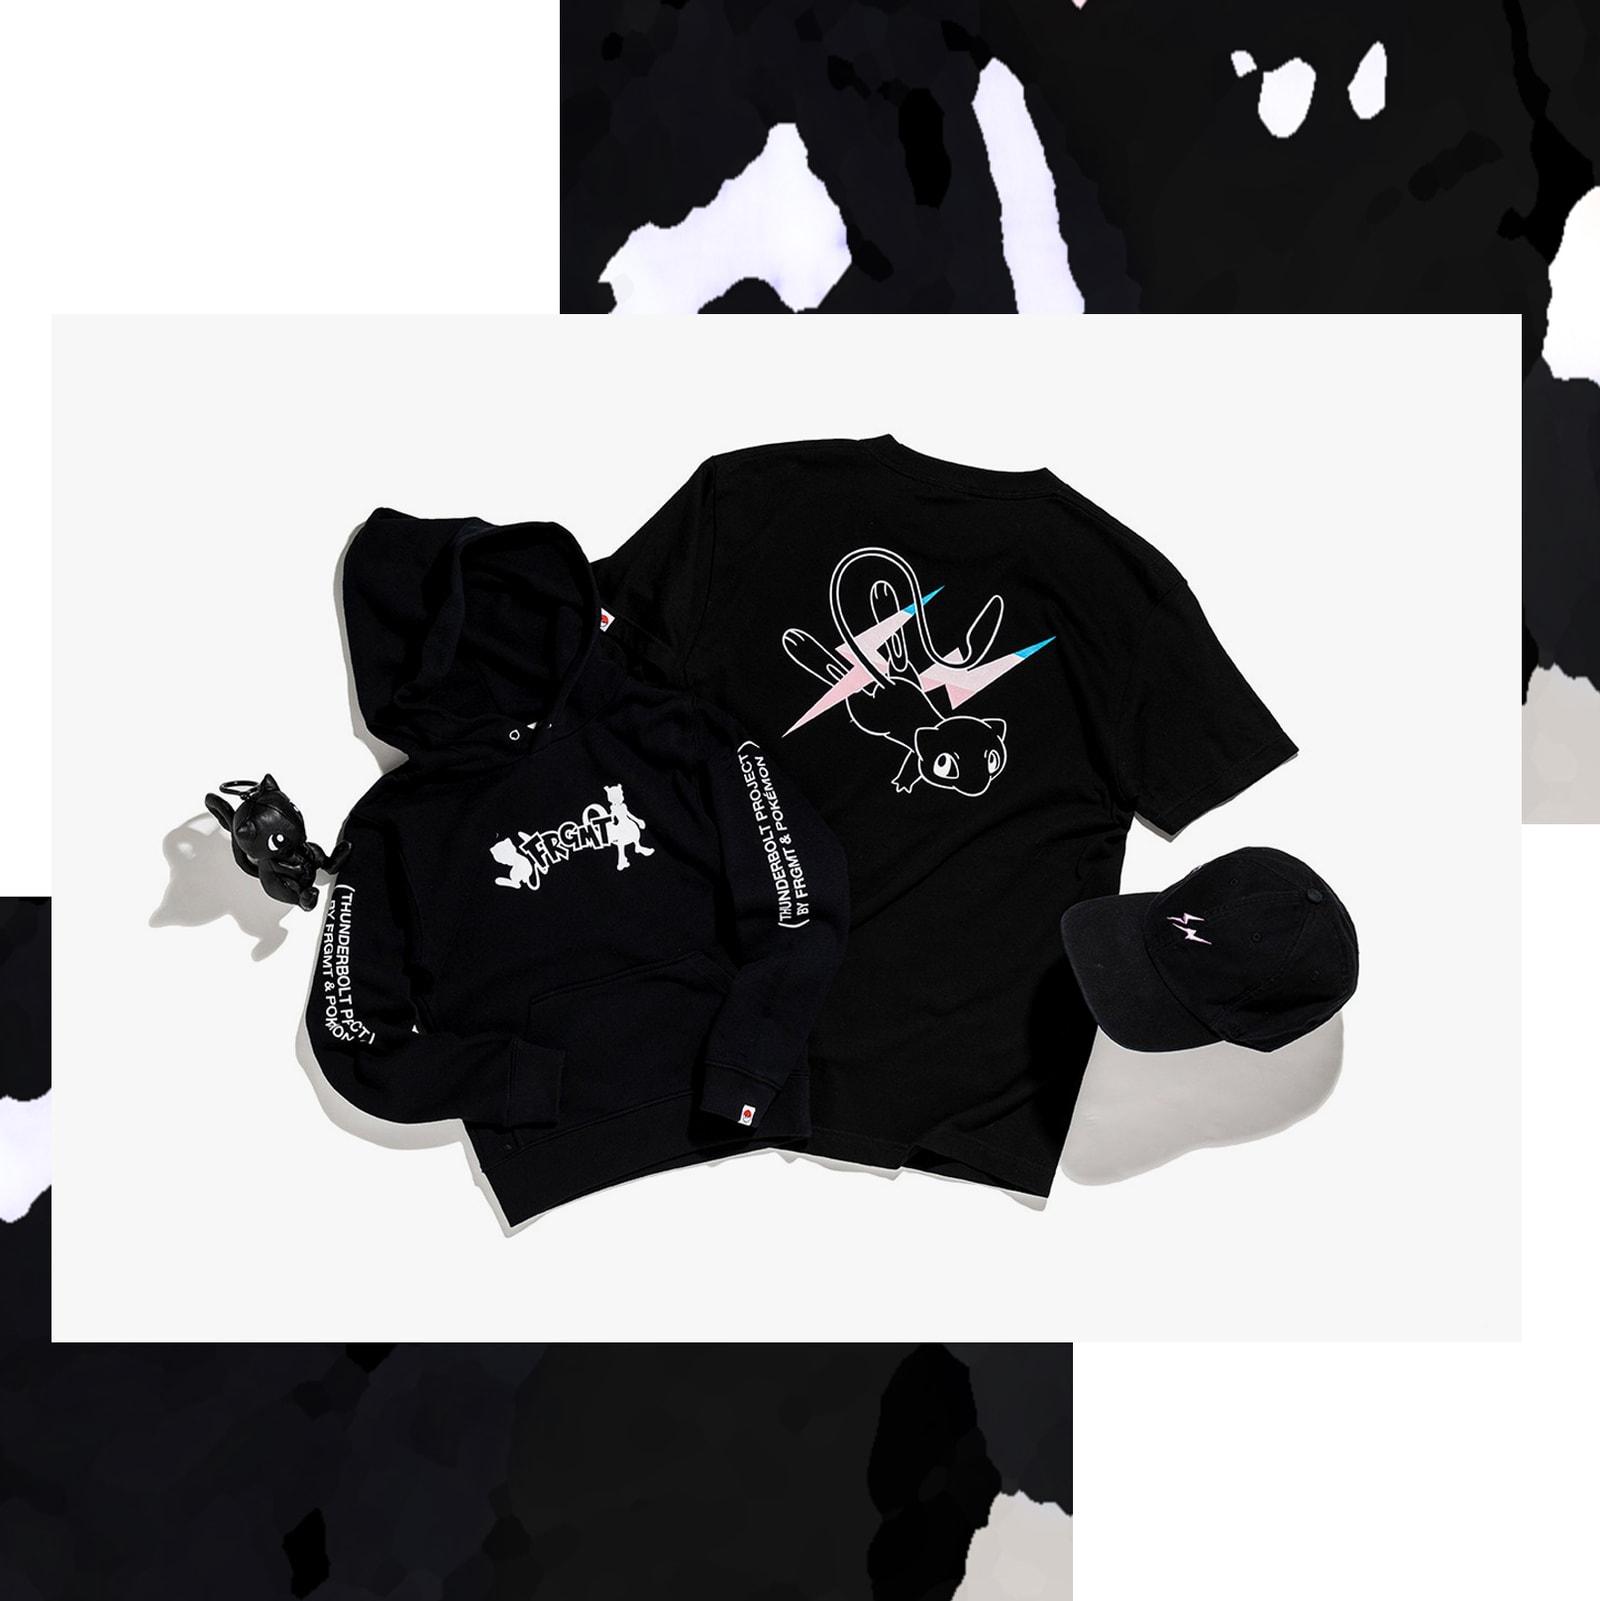 fashion streetwear collaborations dior kaws louis vuitton supreme palace ralph lauren pikachu fragment pokemon the ten nike virgil abloh moncler genius kanye west yeezy adidas rick owens raf simons ruby sterling hypefest